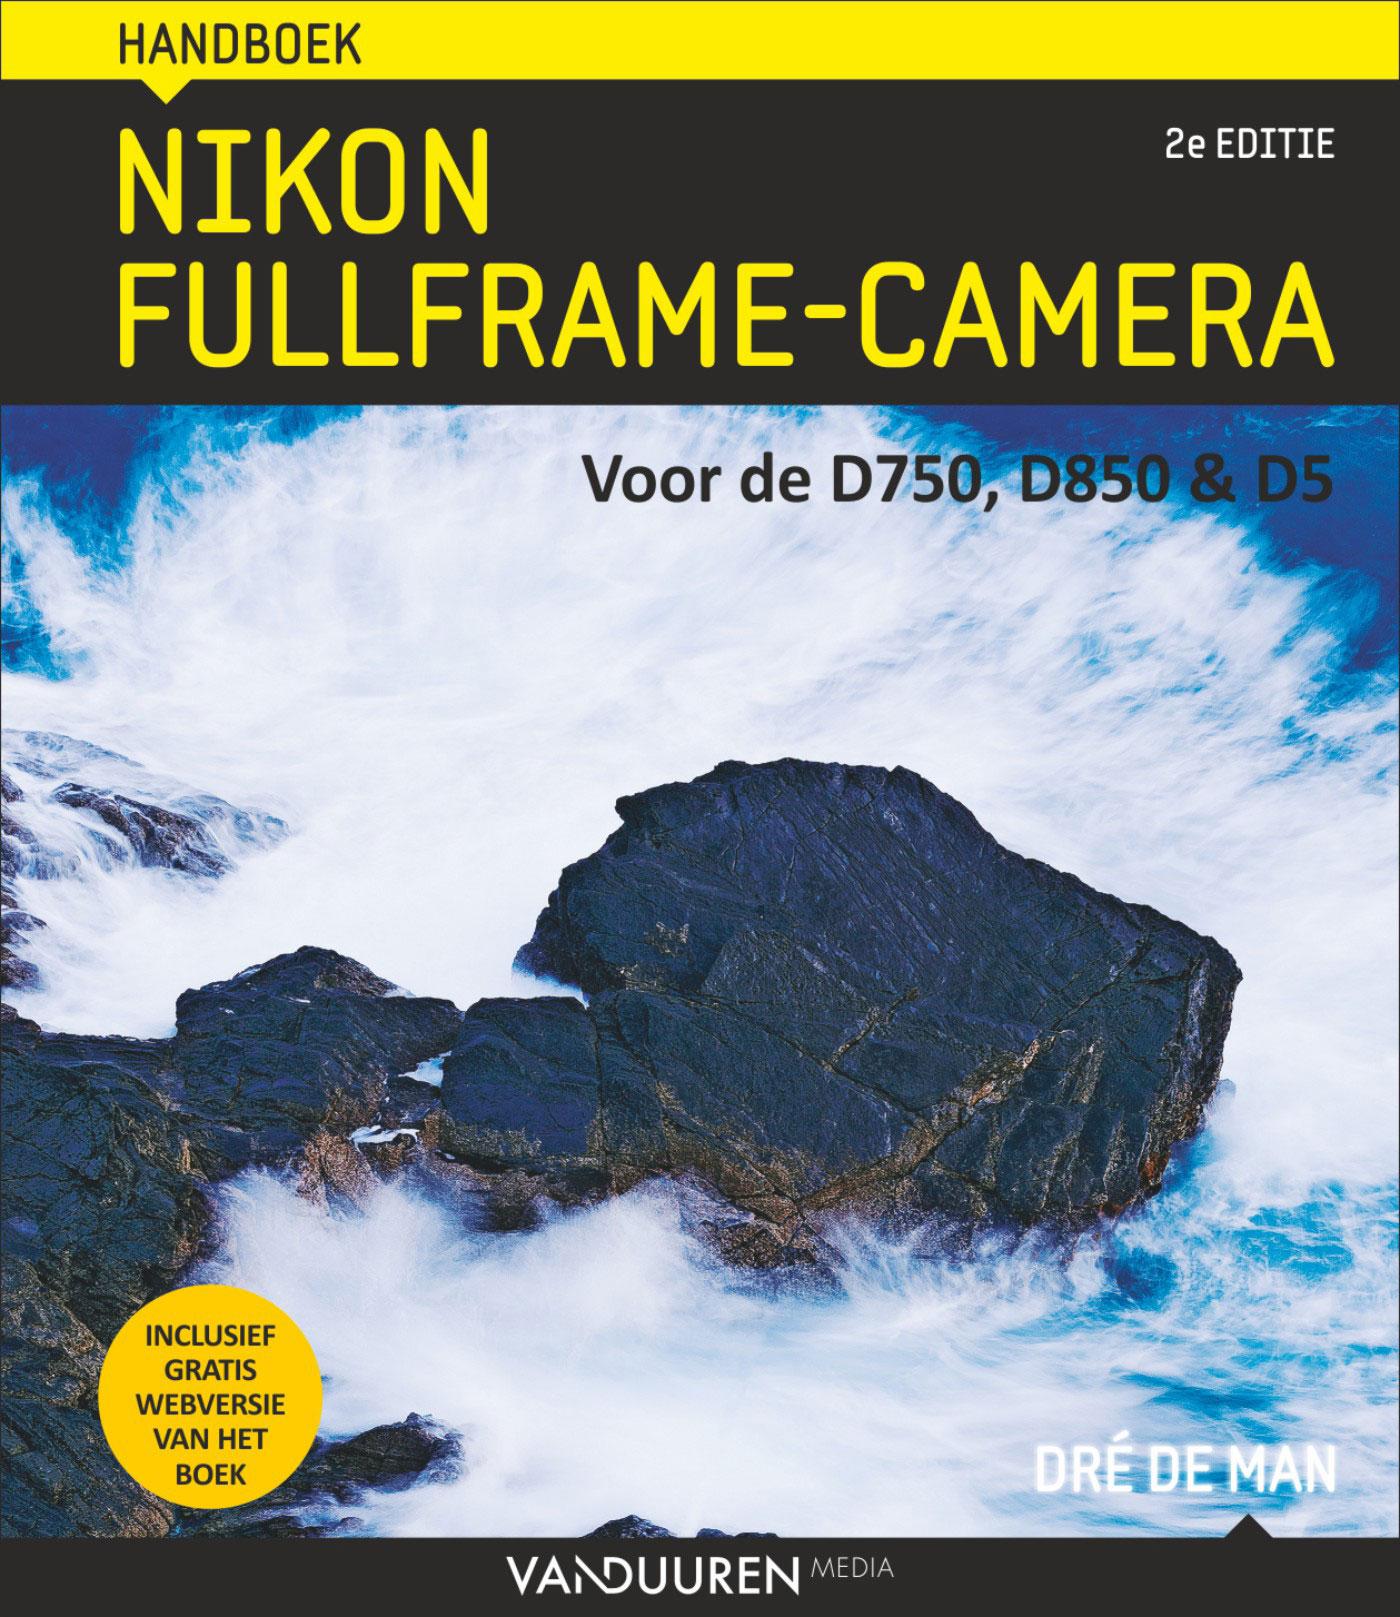 Handboek Nikon Fullframe-camera, 2e editie- Dré de Man, isbn 9789463560115